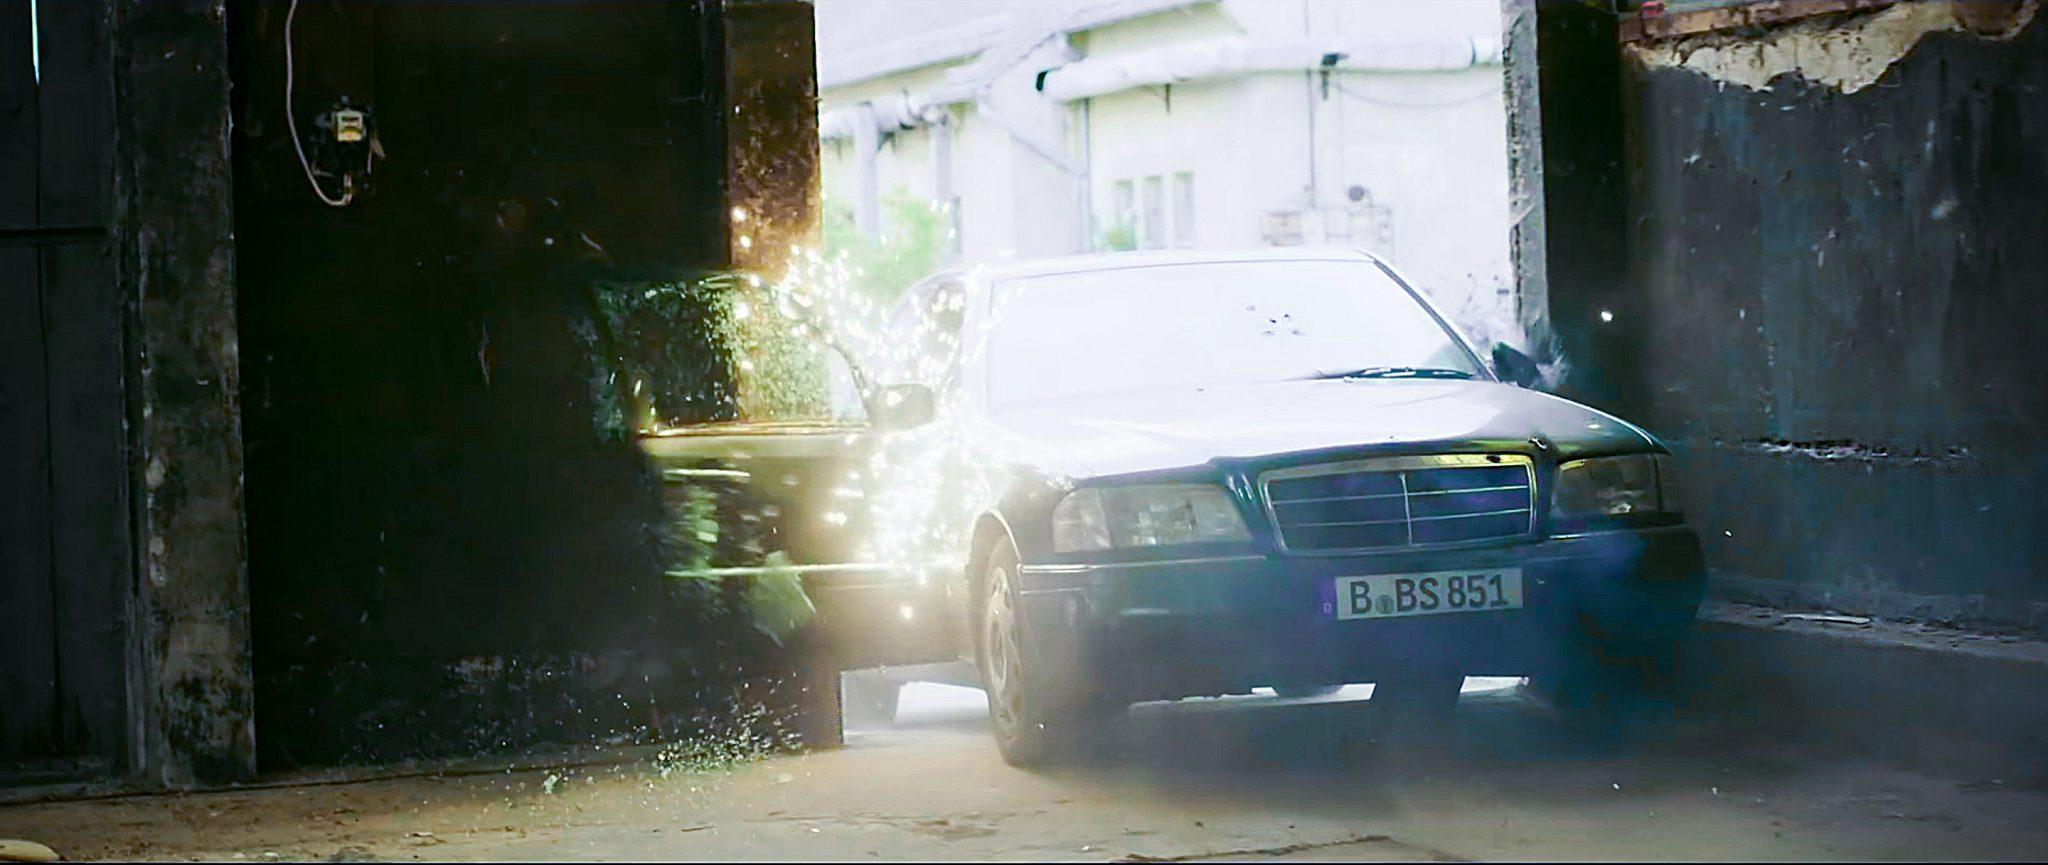 MG ACTION, Autostunt Deutschland, Carcrash Berlin, Precision driver Deutschland, Stuntdriver deutschland